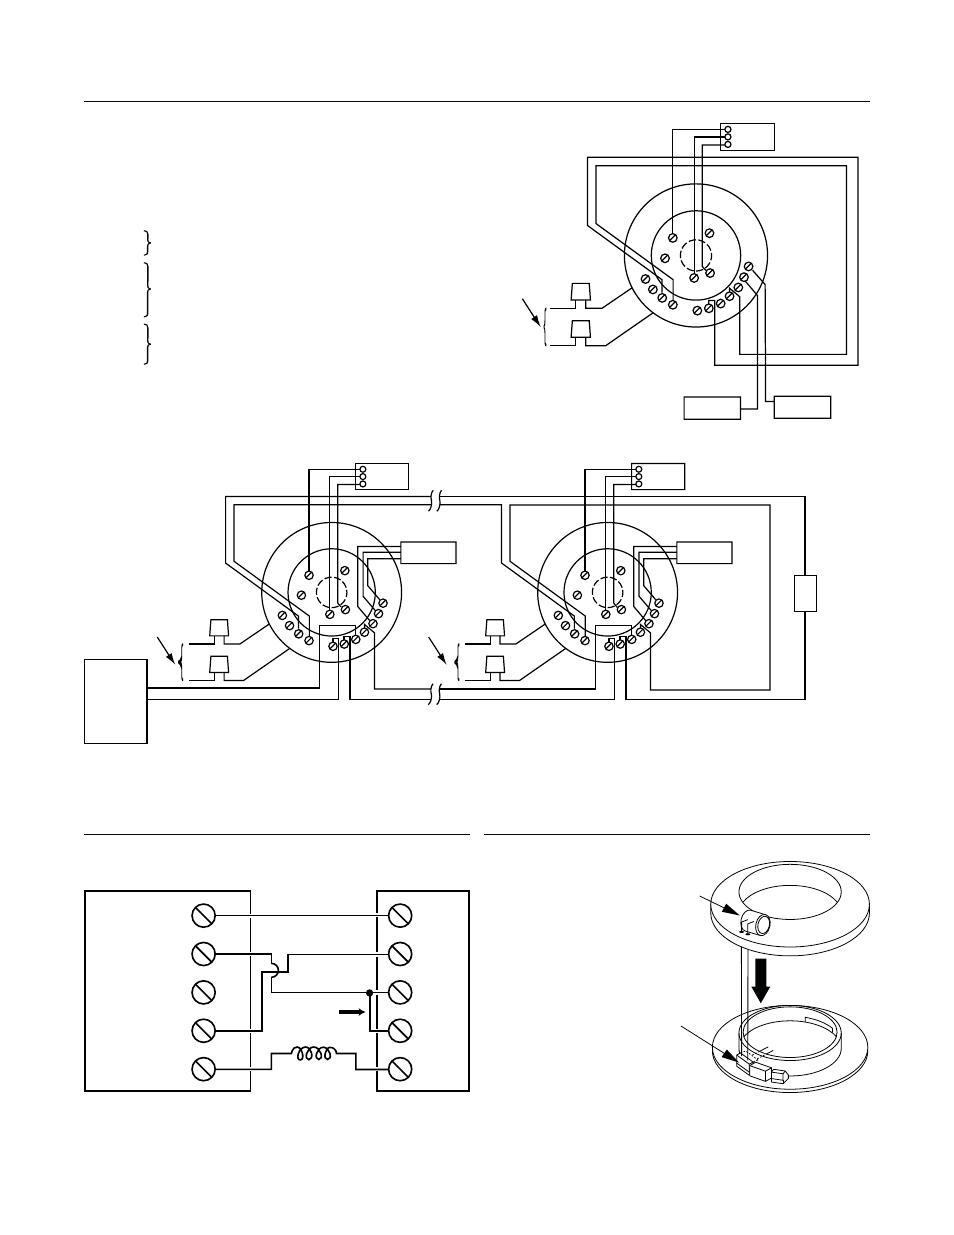 B114lpbt Typical Wiring Diagrams